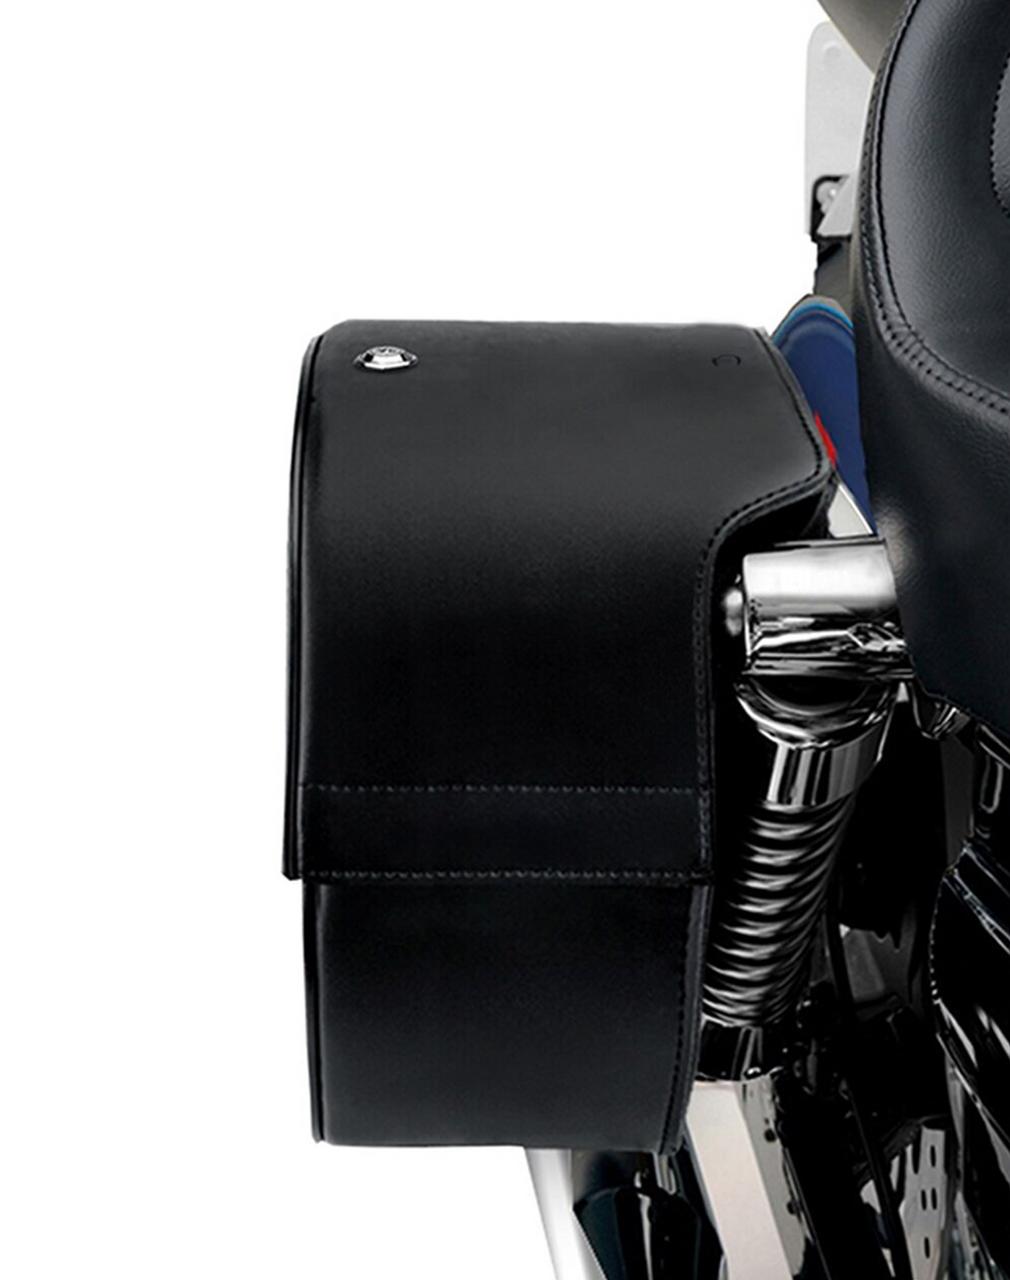 Honda CMX 250C Rebel 250 Shock Cutout Slanted Large Motorcycle Saddlebags Shock Cutout View